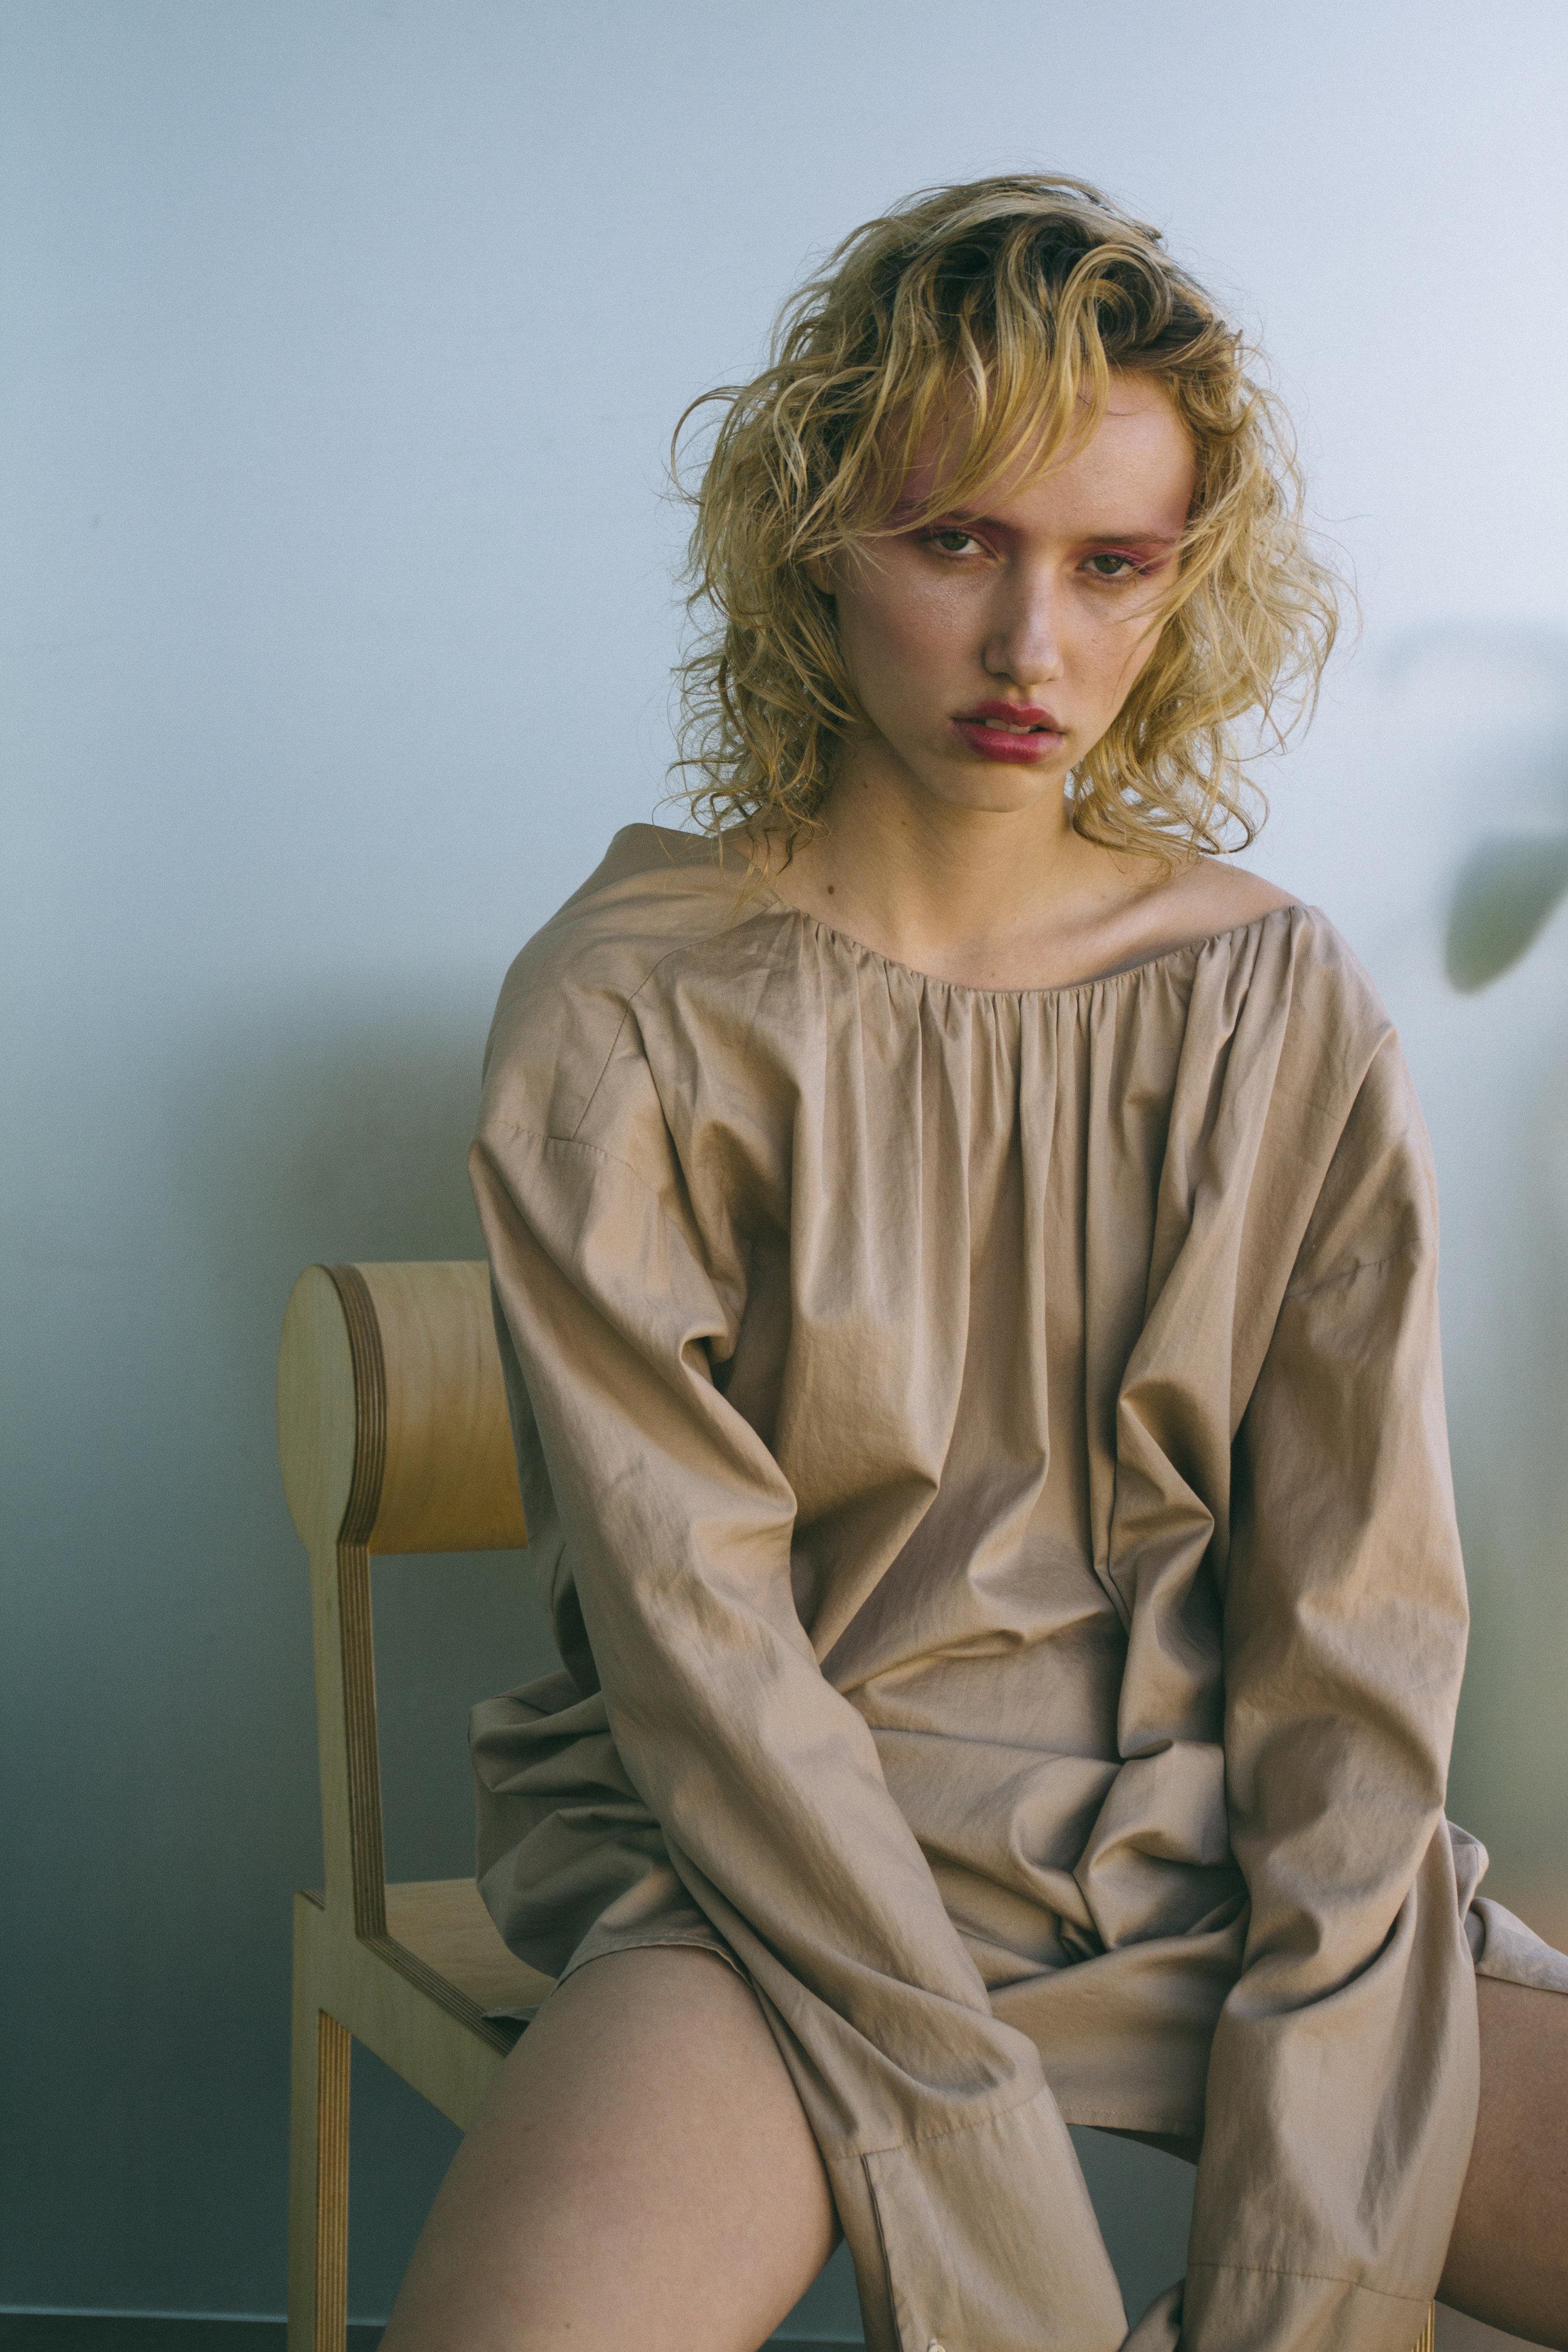 Jessa-Carter-NothingIsRealButTheGirl18_229.jpg